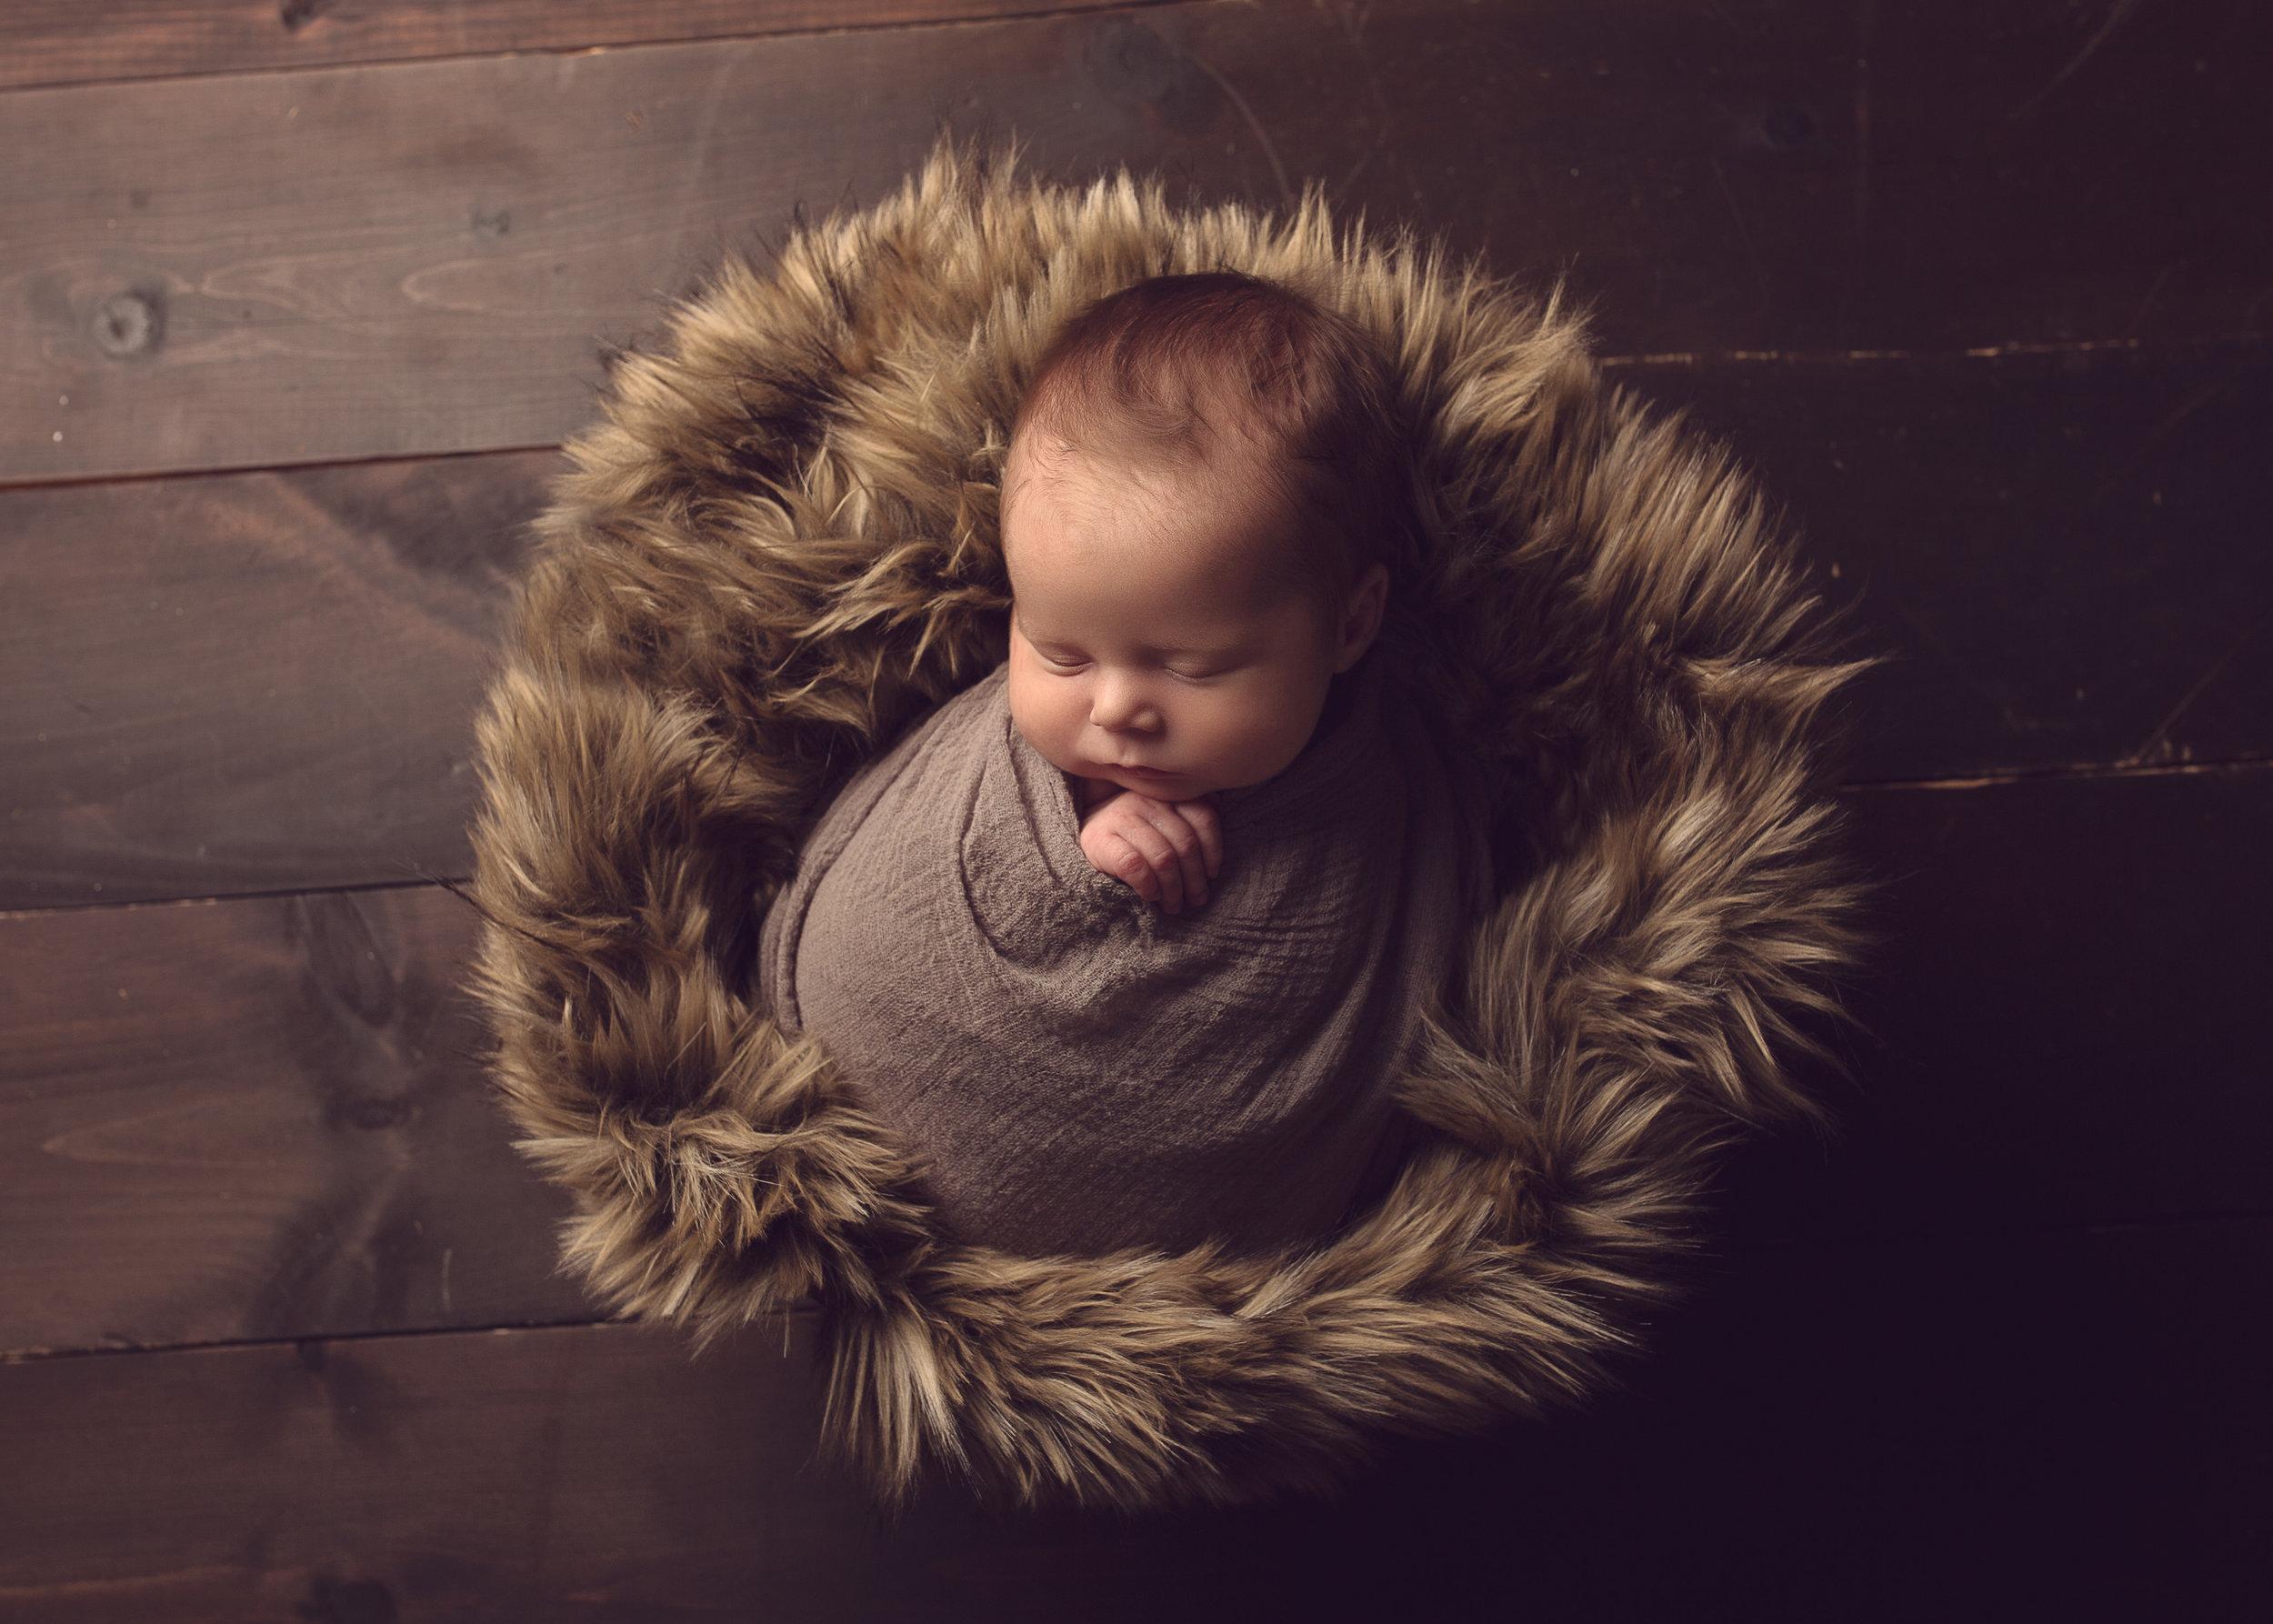 millbury_newborn_photographer_massachusetts_boston_baby_boy_photos3.jpg